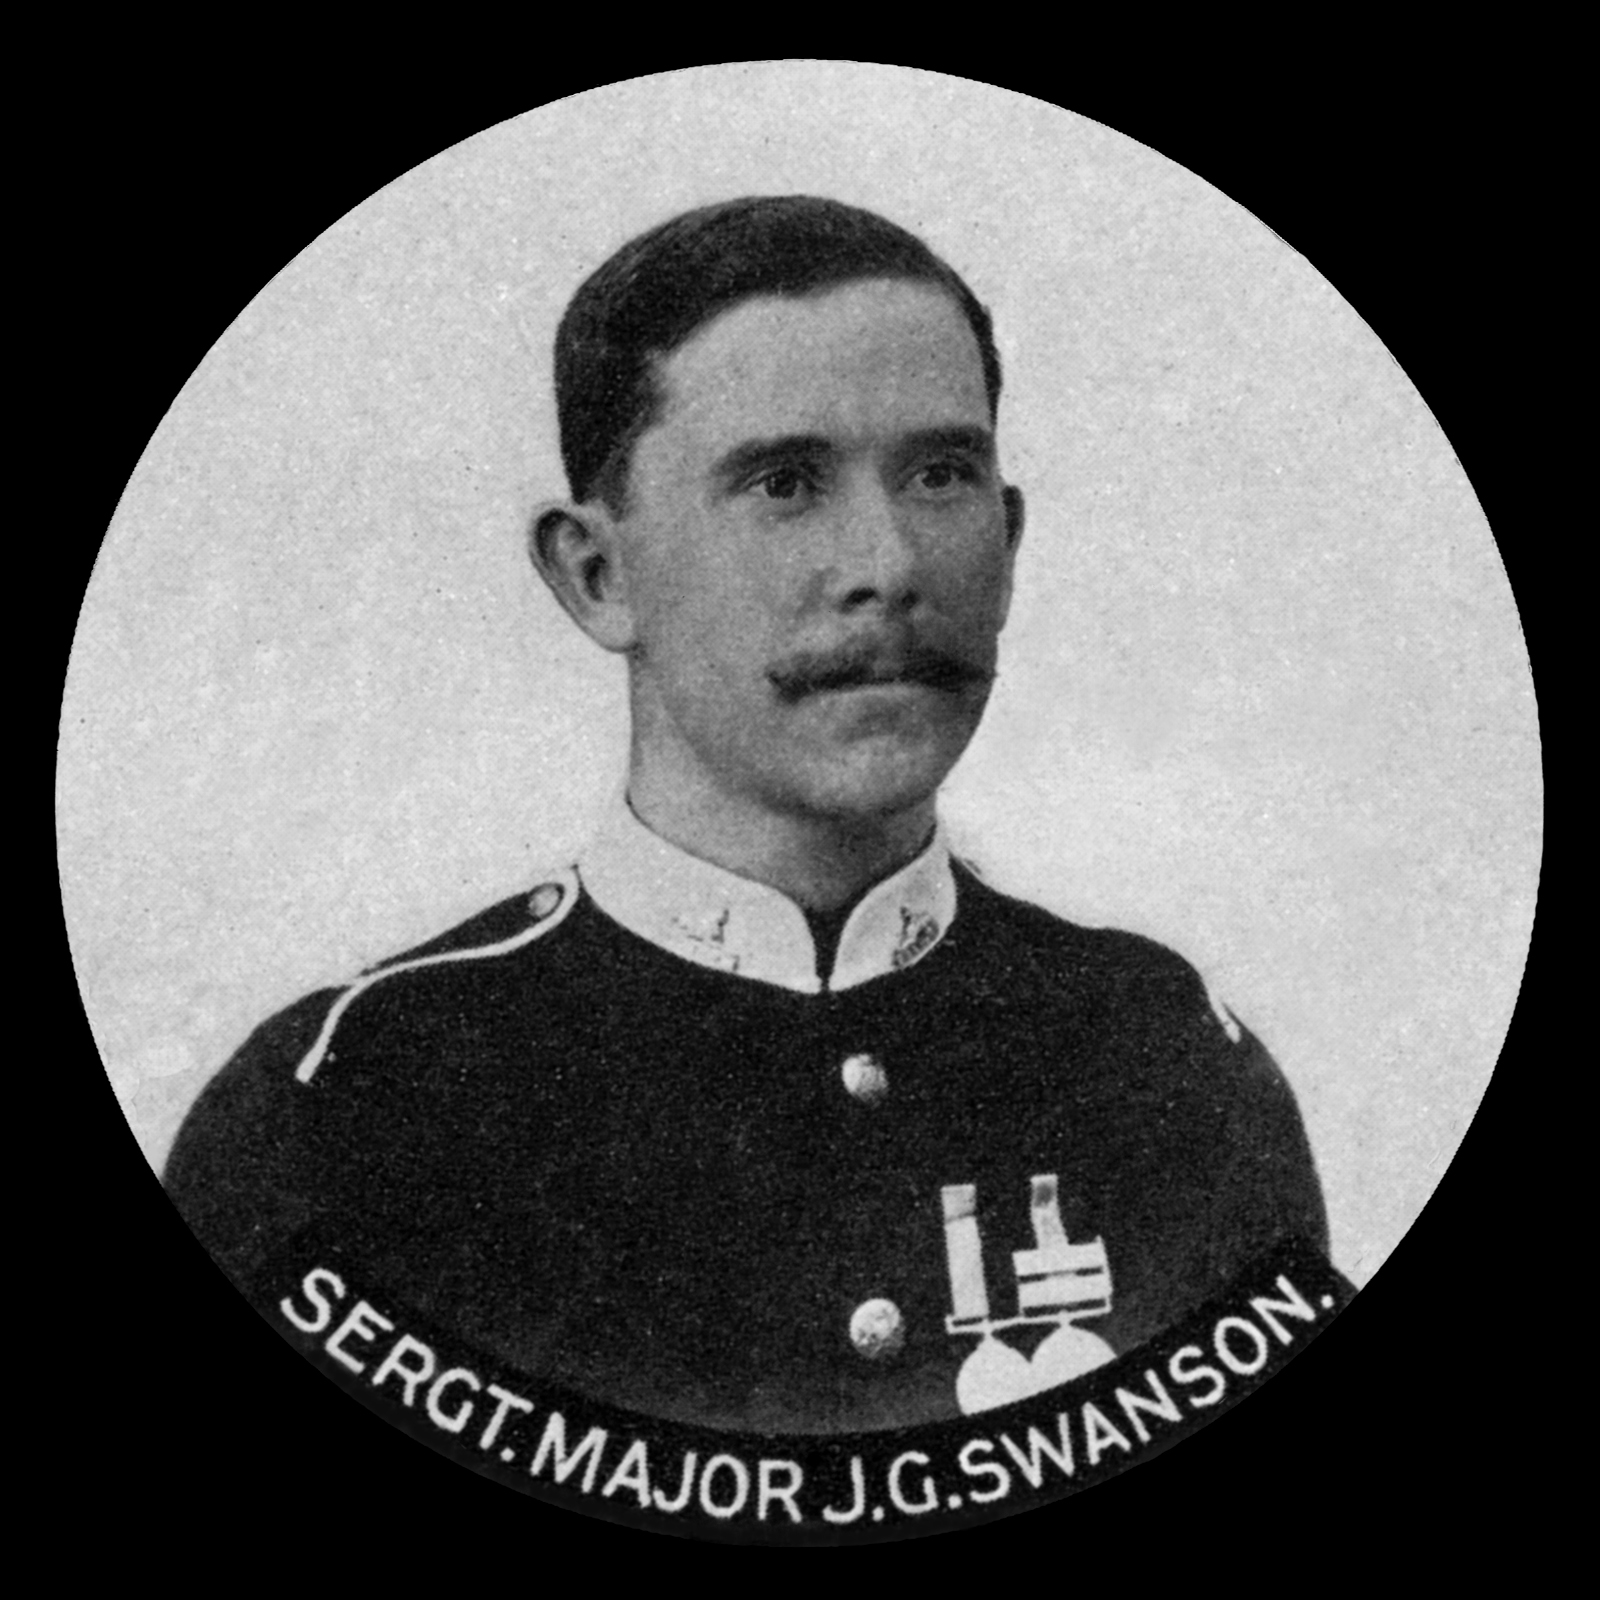 SWANSON John George